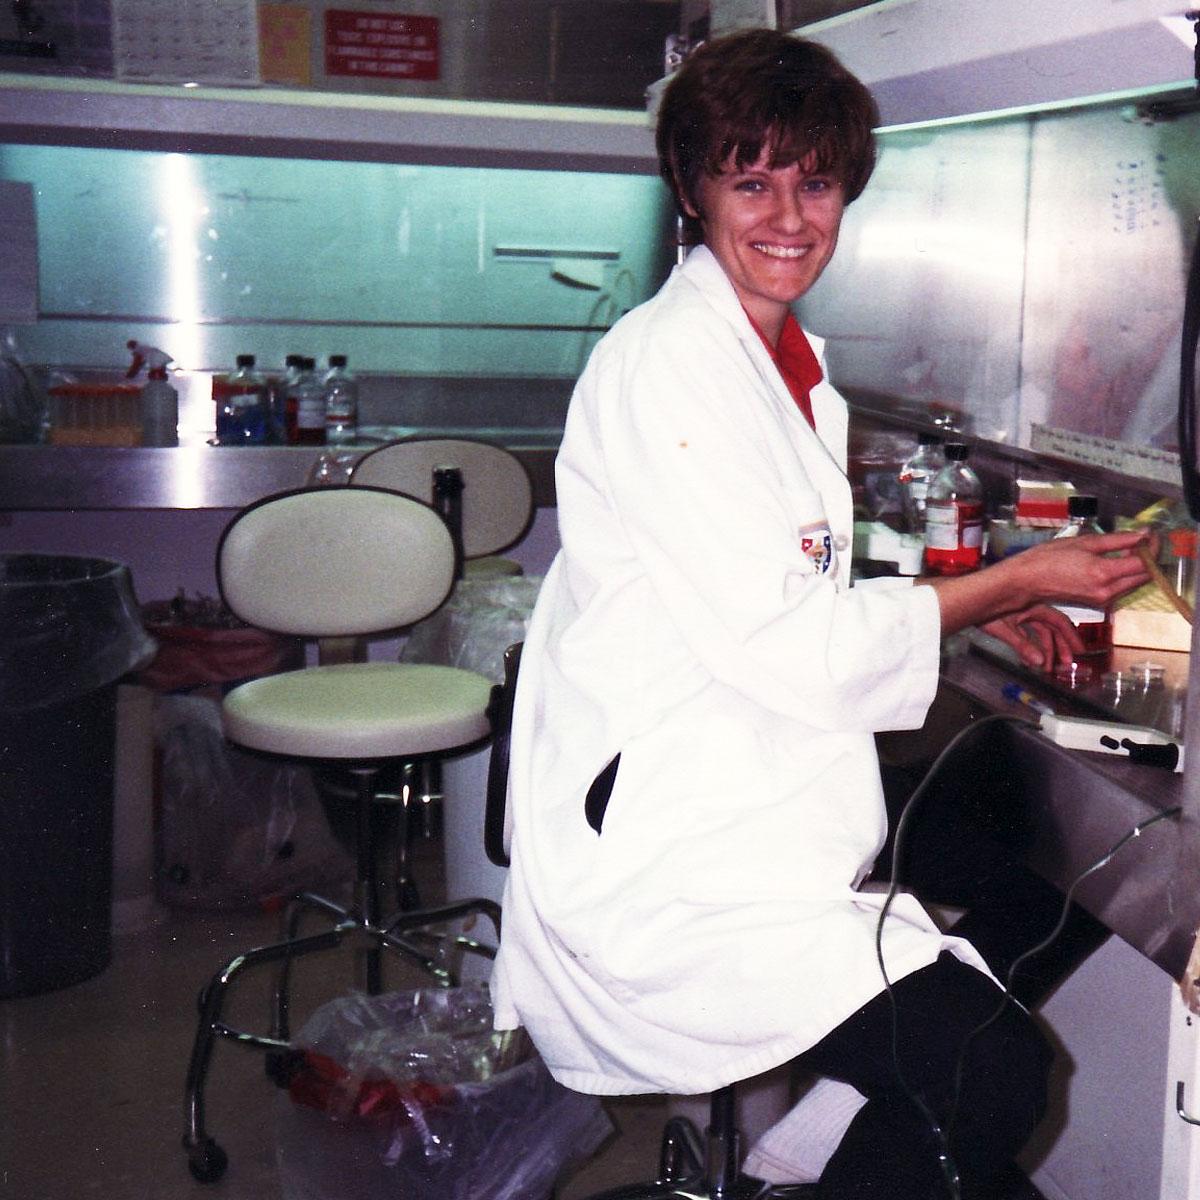 A young Dr. Katalin Karikó smiling in a lab coat.